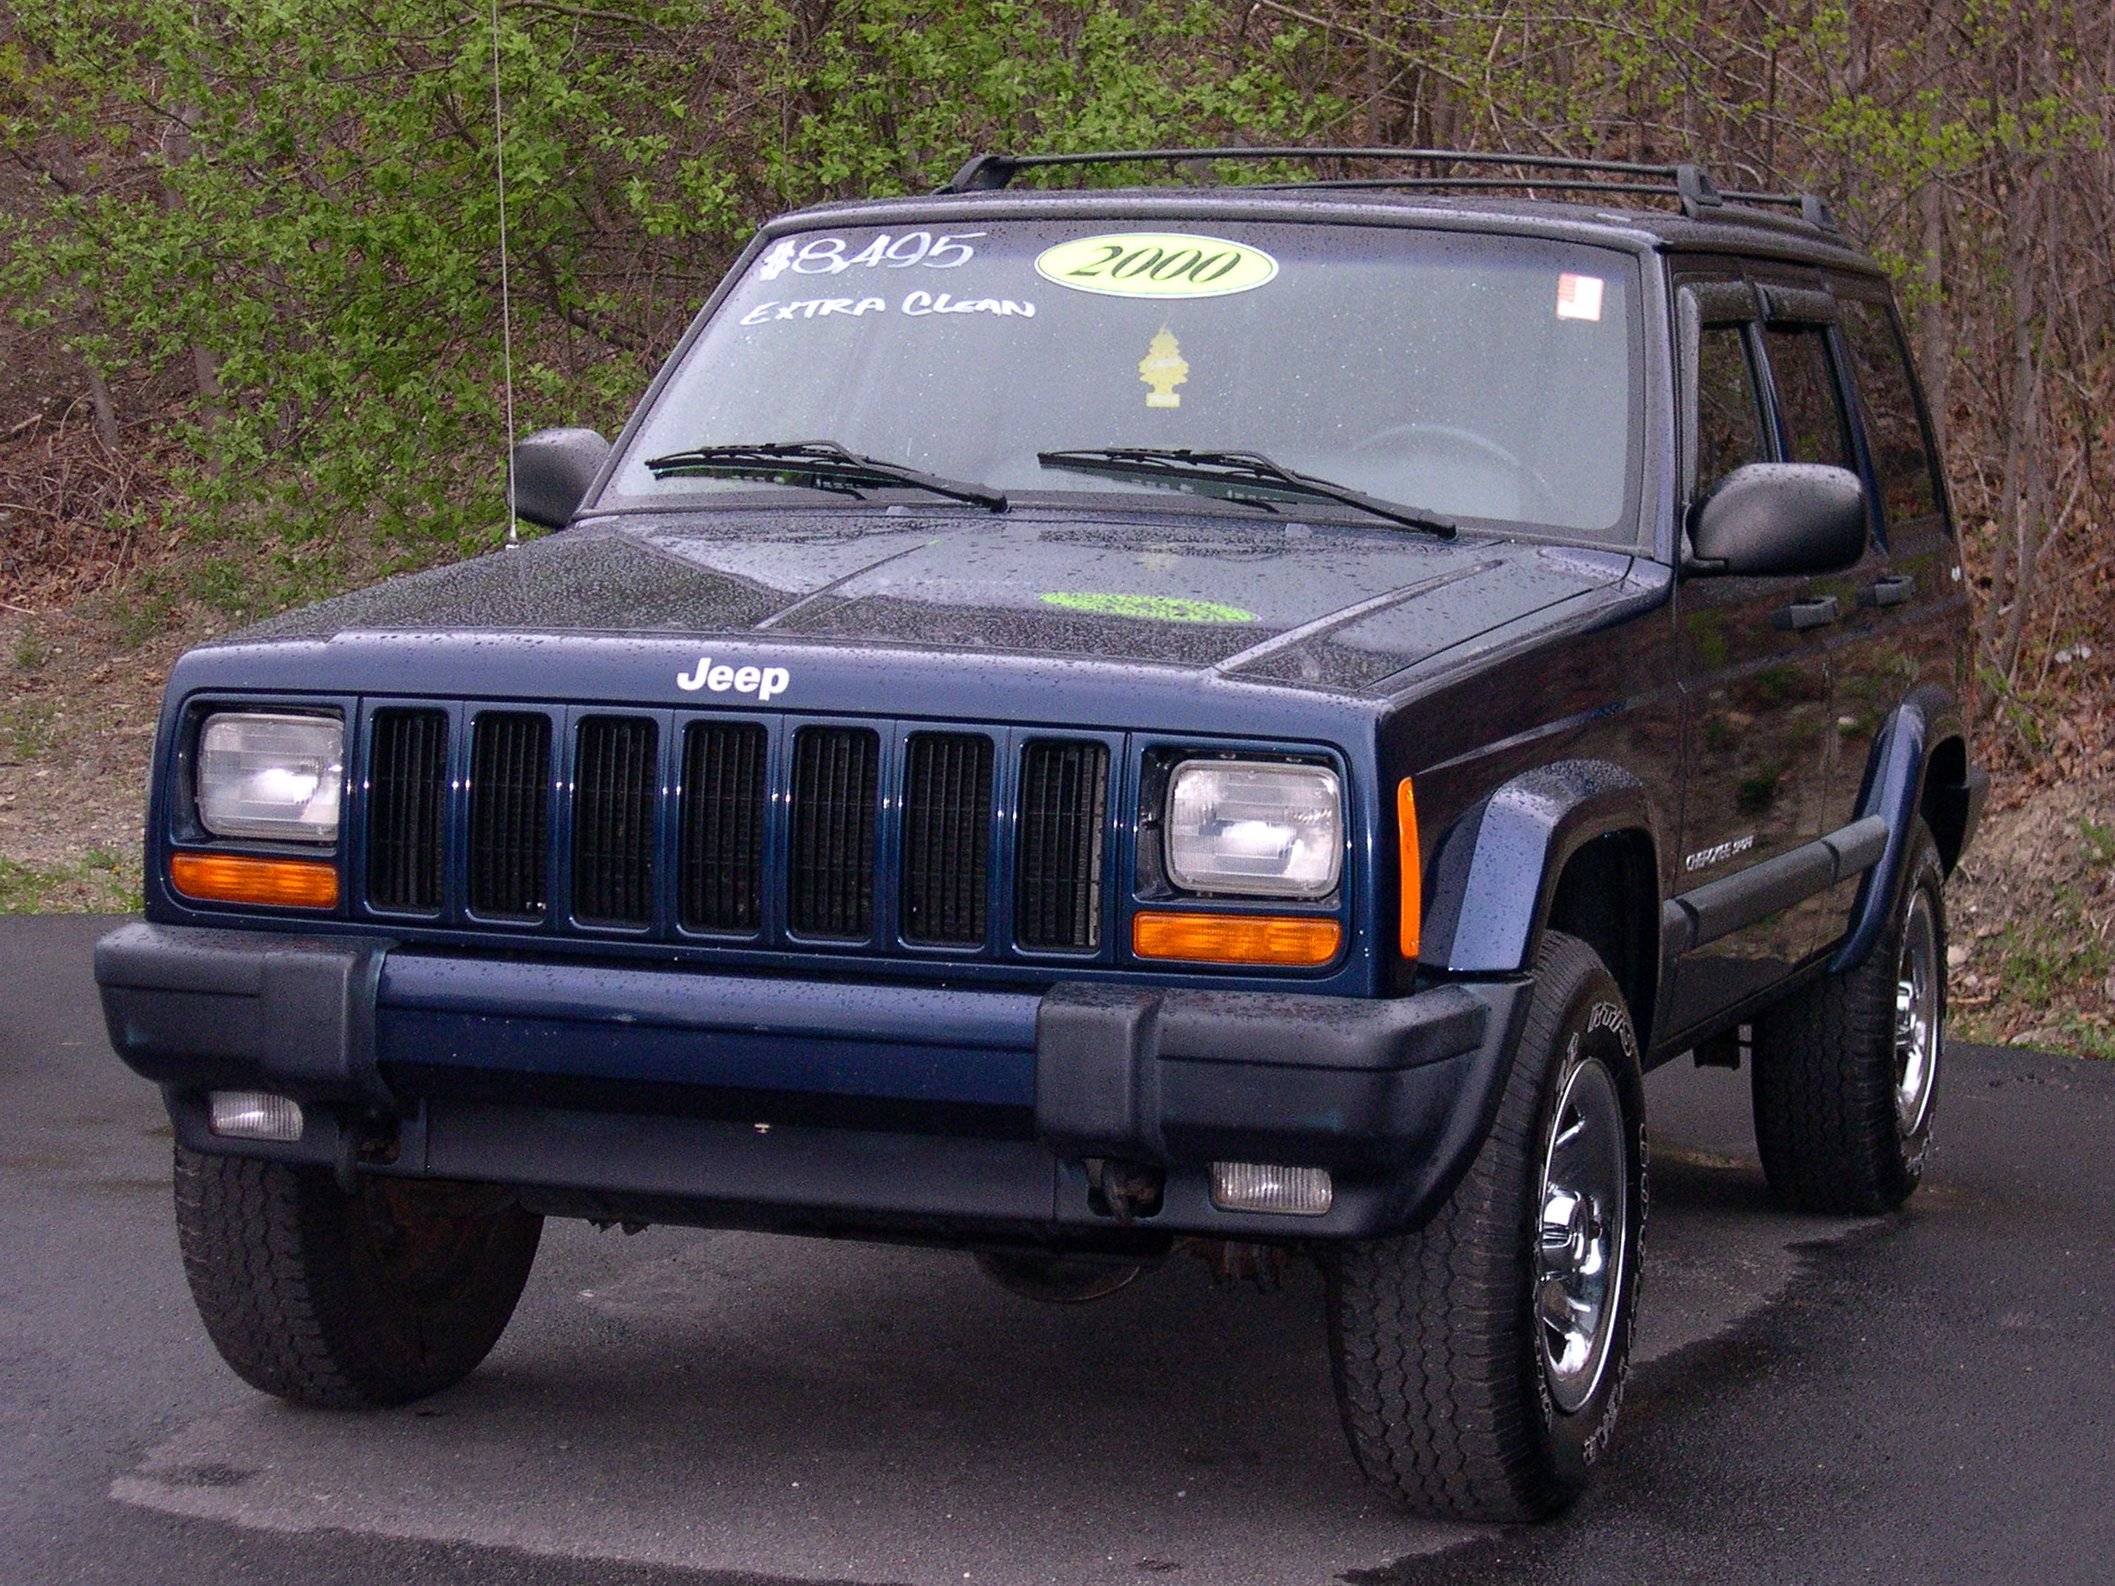 2007 Gmc Sierra Brake Controller Wiring Automotive Diagram Wk Grand Cherokee Get Free Image About Install 2011